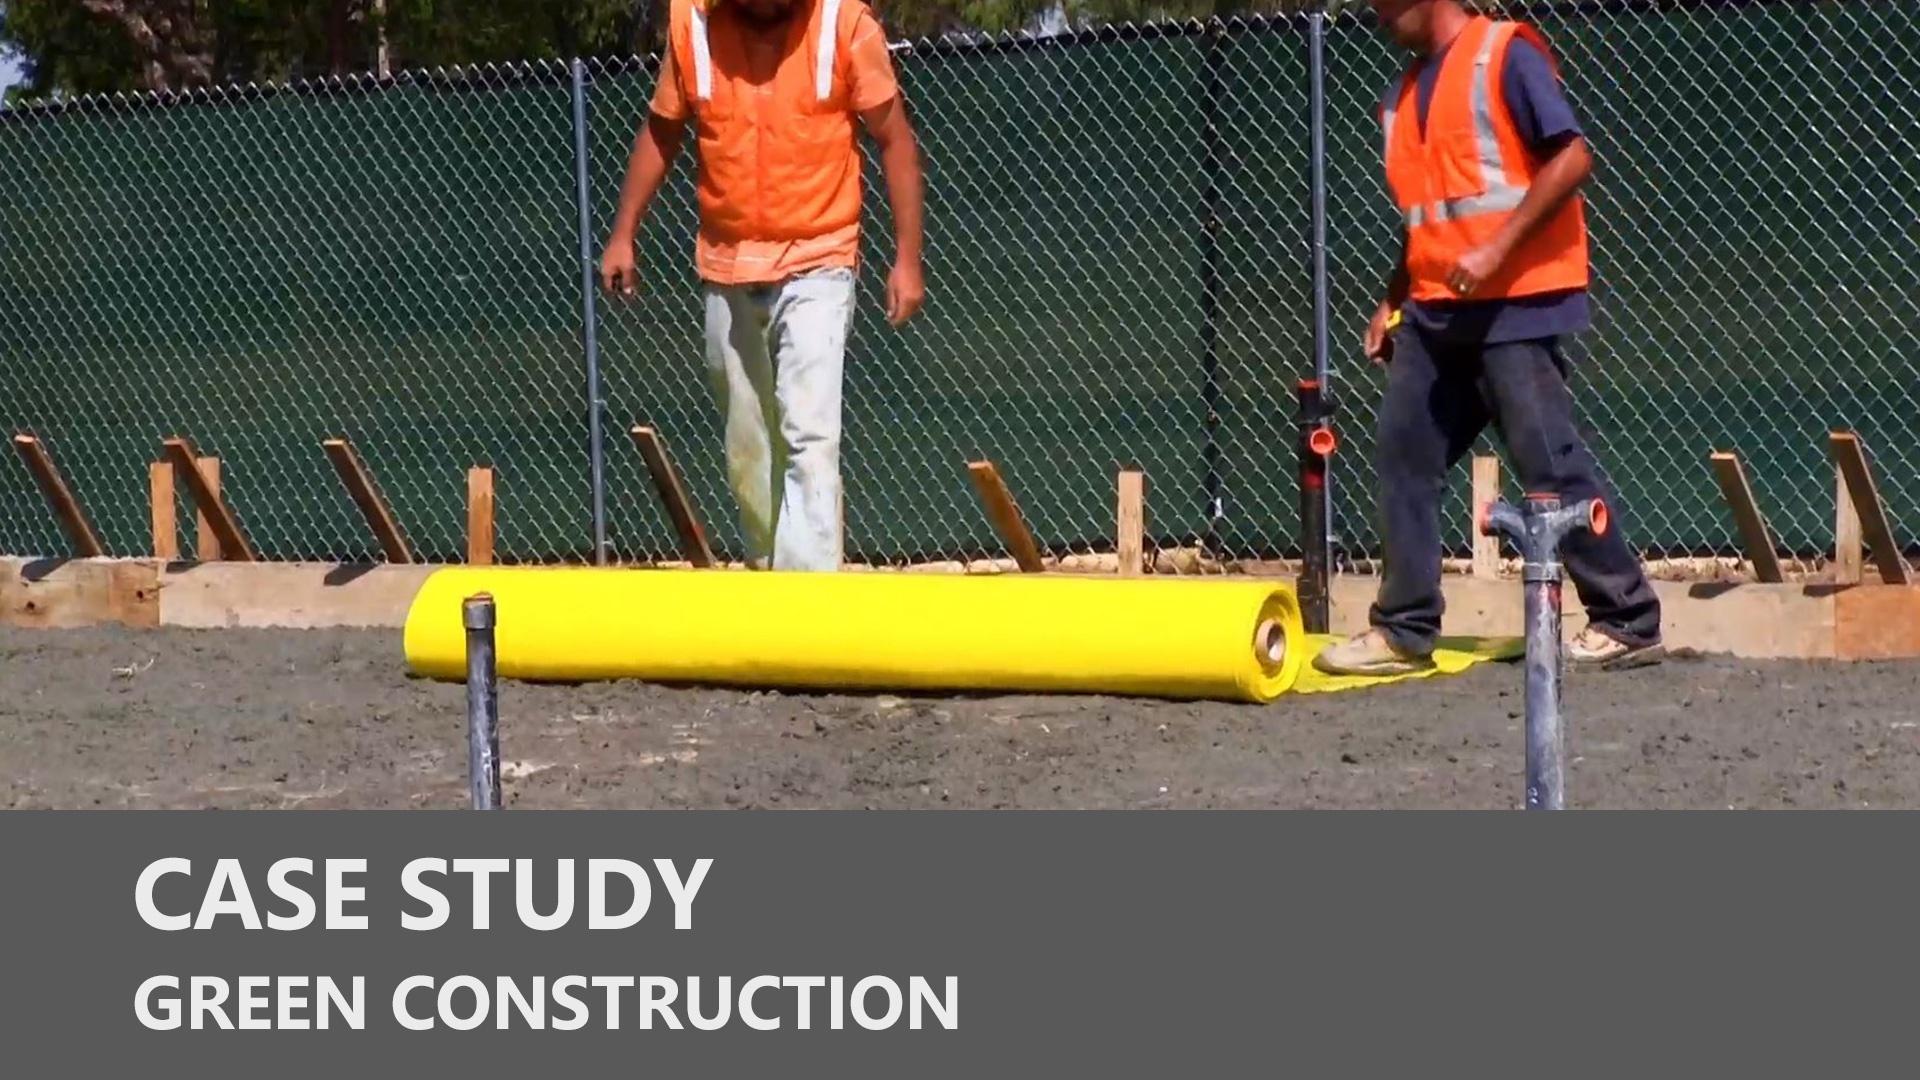 Thumbnail-Web-Case-Study-Green-Construction